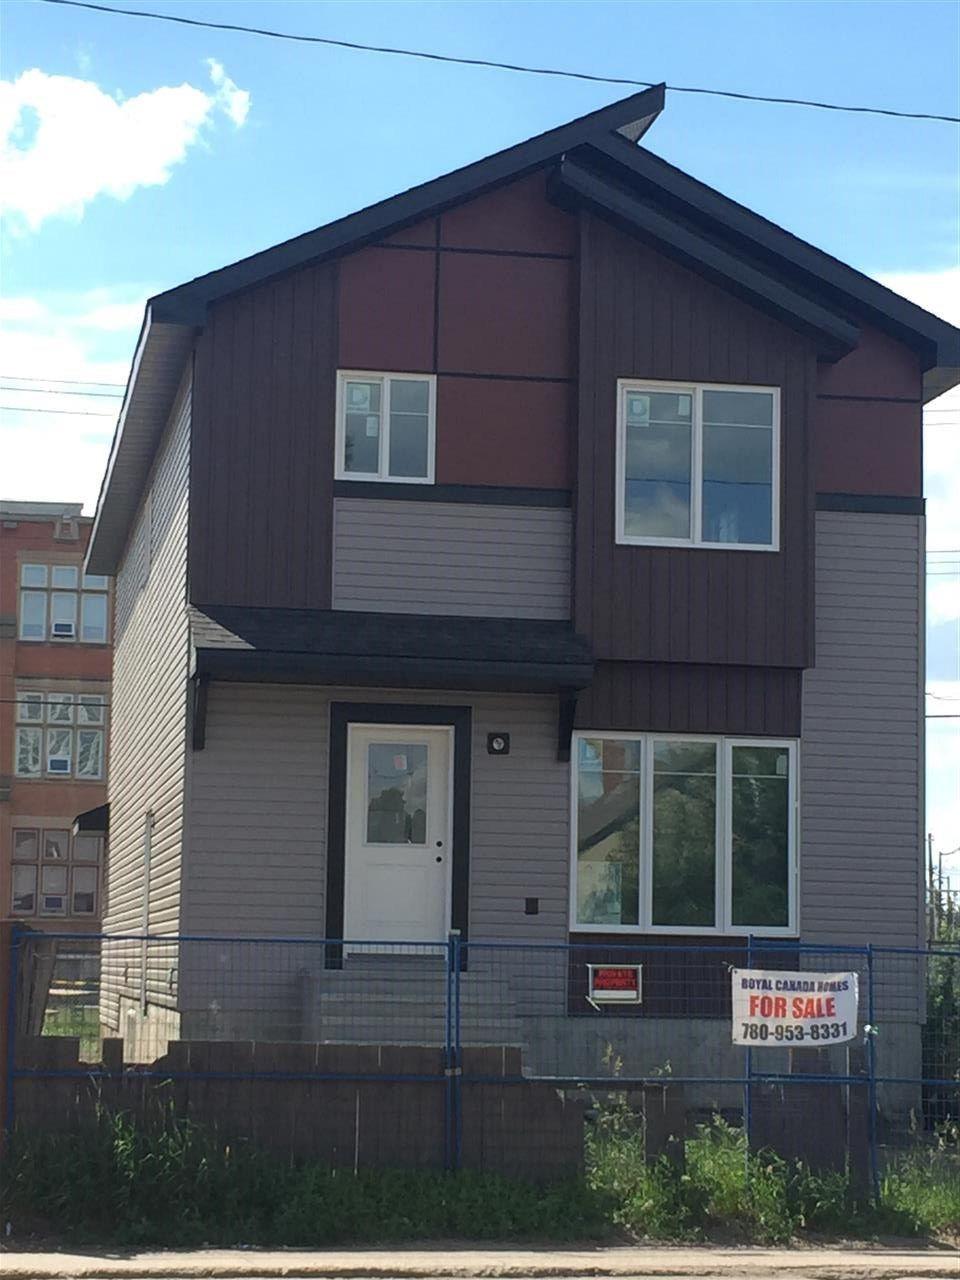 Main Photo: 10712 95 ST in Edmonton: Zone 13 House for sale : MLS®# E4149560